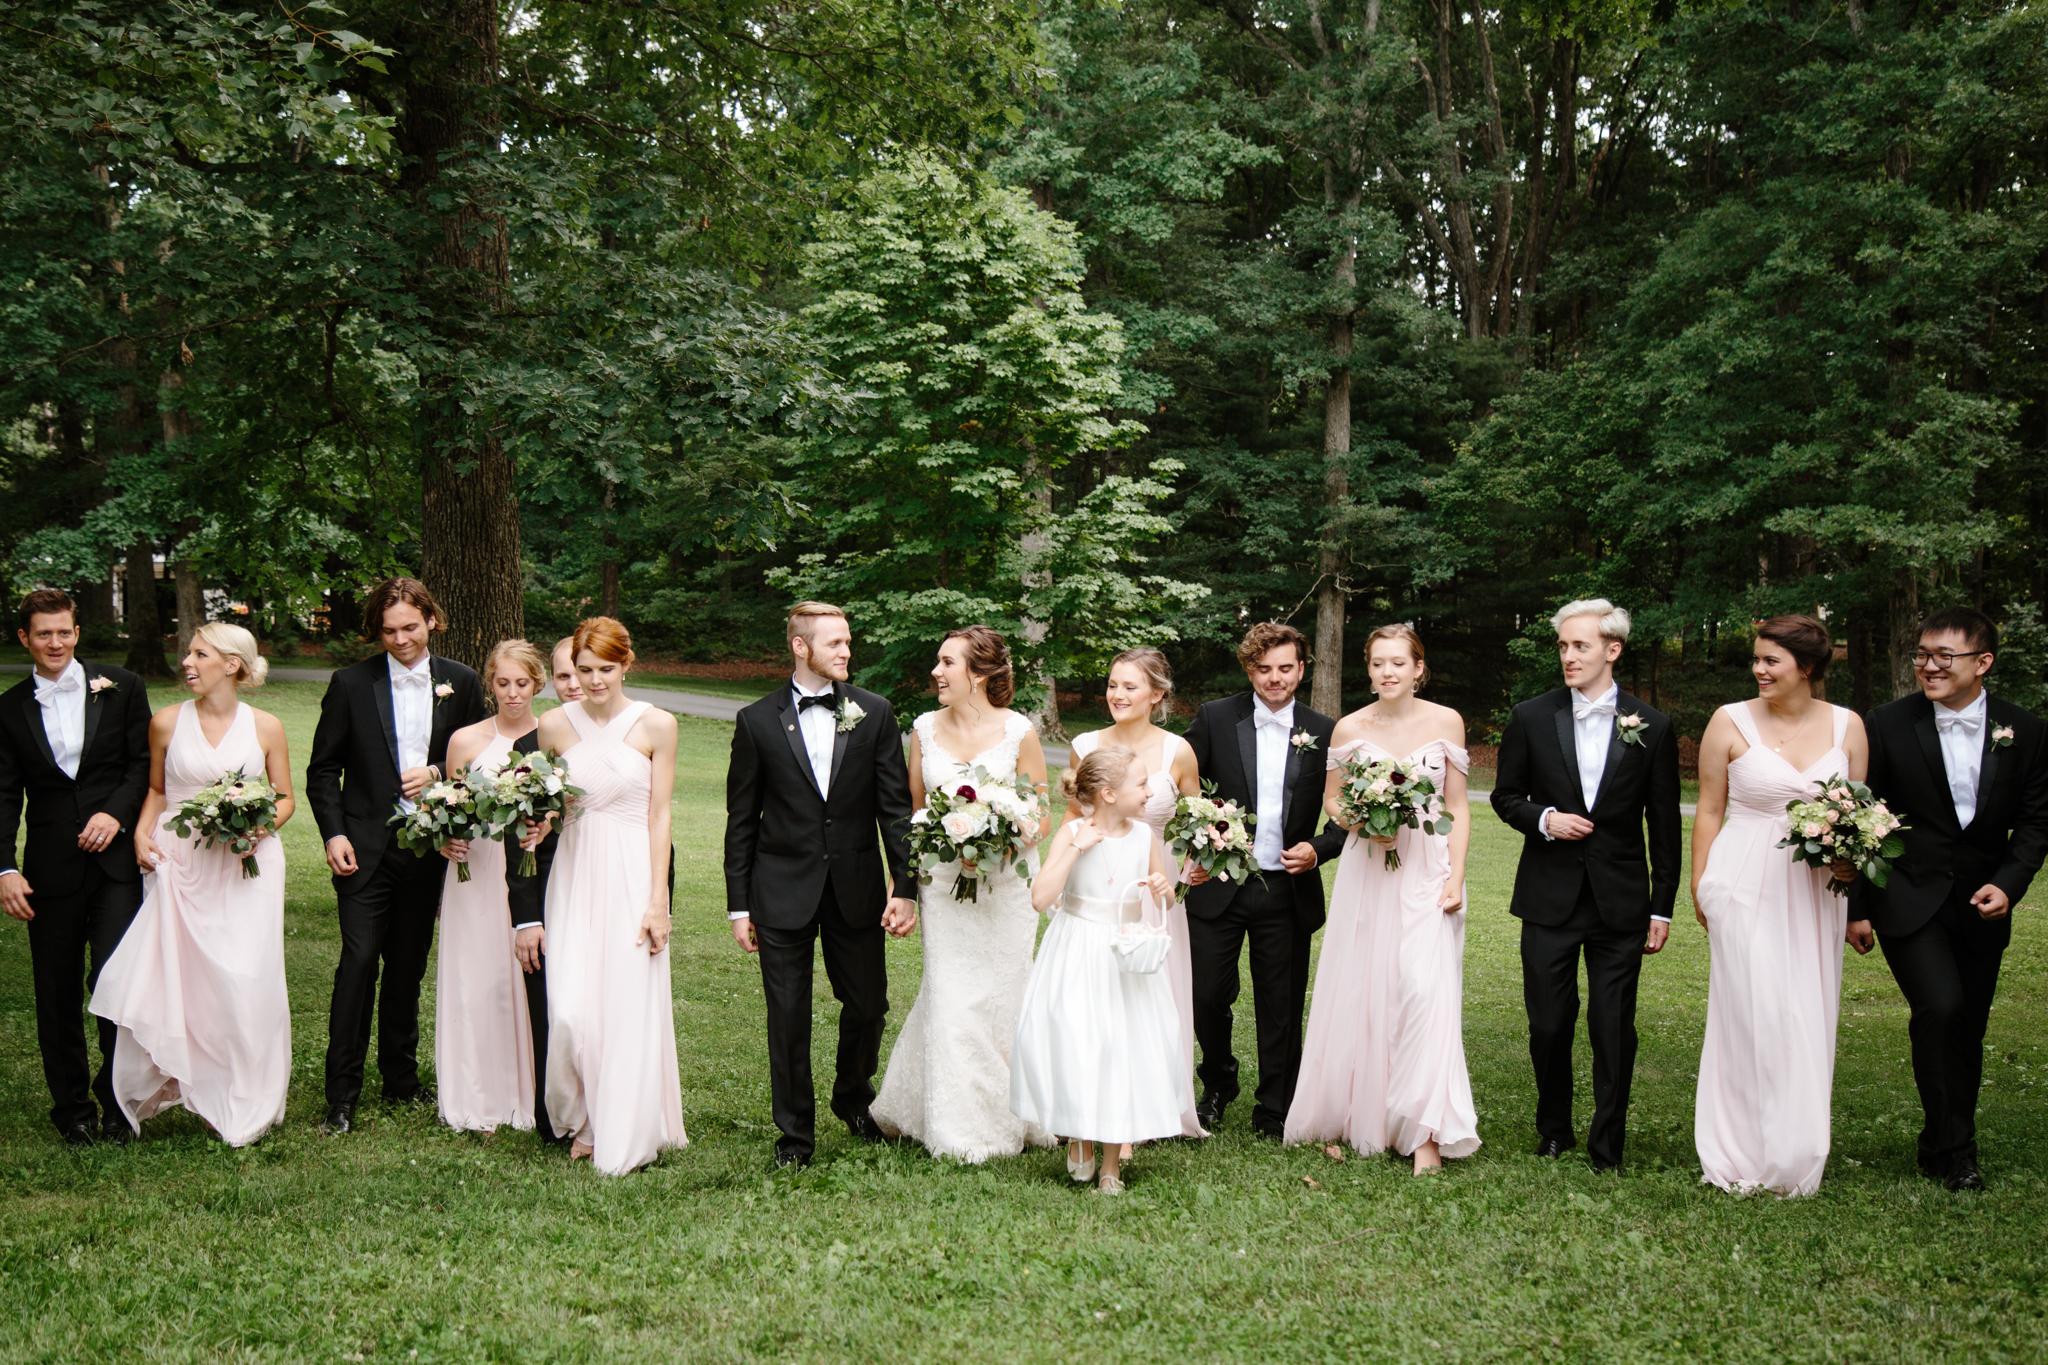 Keswick-Vineyards-Wedding_18.jpg